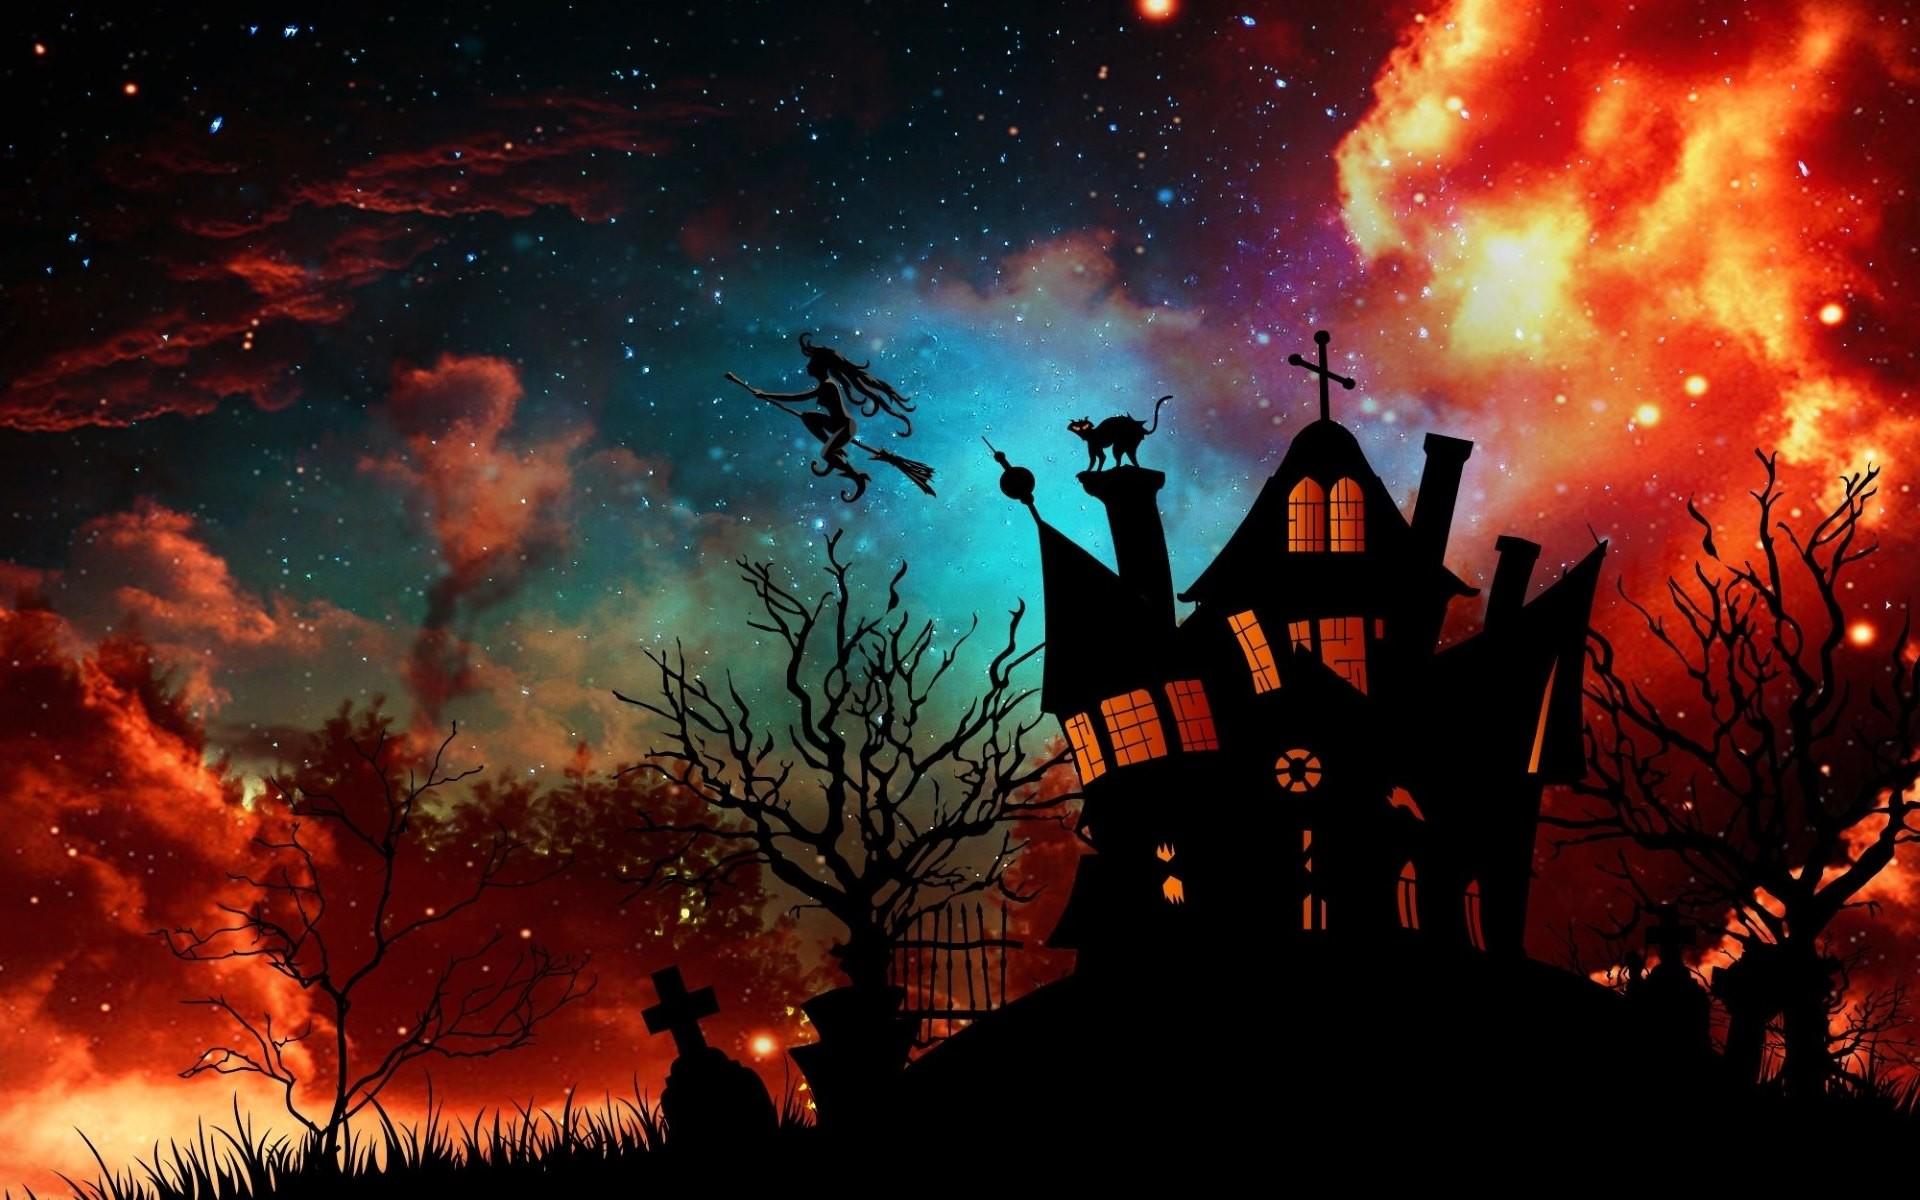 Halloween Wallpaper in HQ Resolution